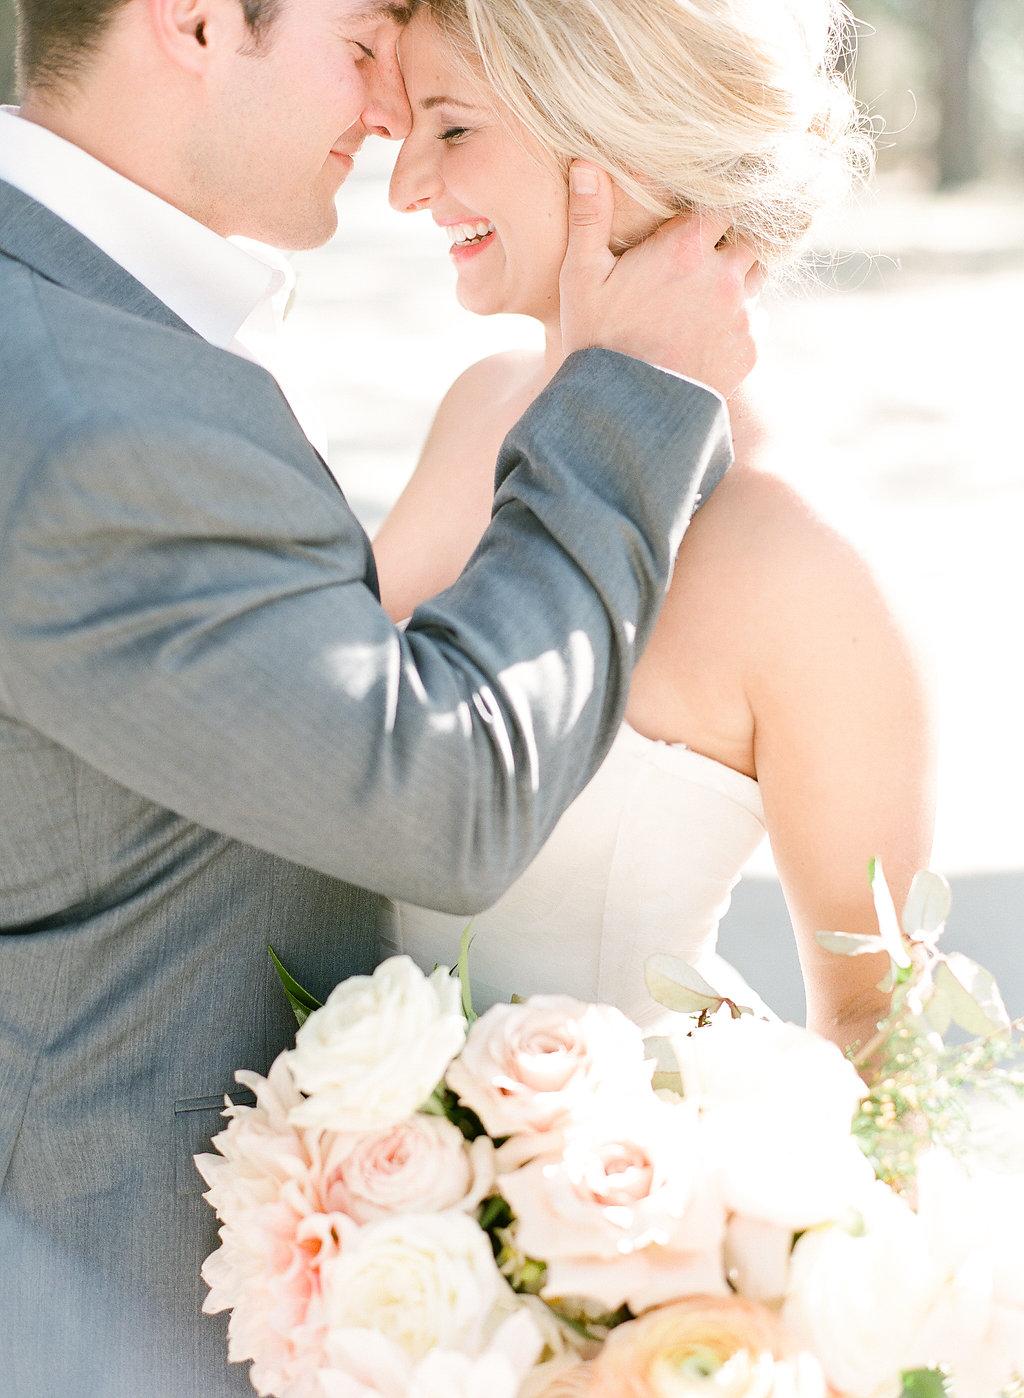 the-happy-bloom-wormsloe-wedding-savannah-wedding-ivory-and-beau-bridal-boutique-savannah-wedding-dresses-savannah-bridal-boutique-georgia-bridal-boutique-design-studio-south-sunset-wedding-blush-by-hayley-paige-candi-1550-blush-wedding-dress-1.jpg